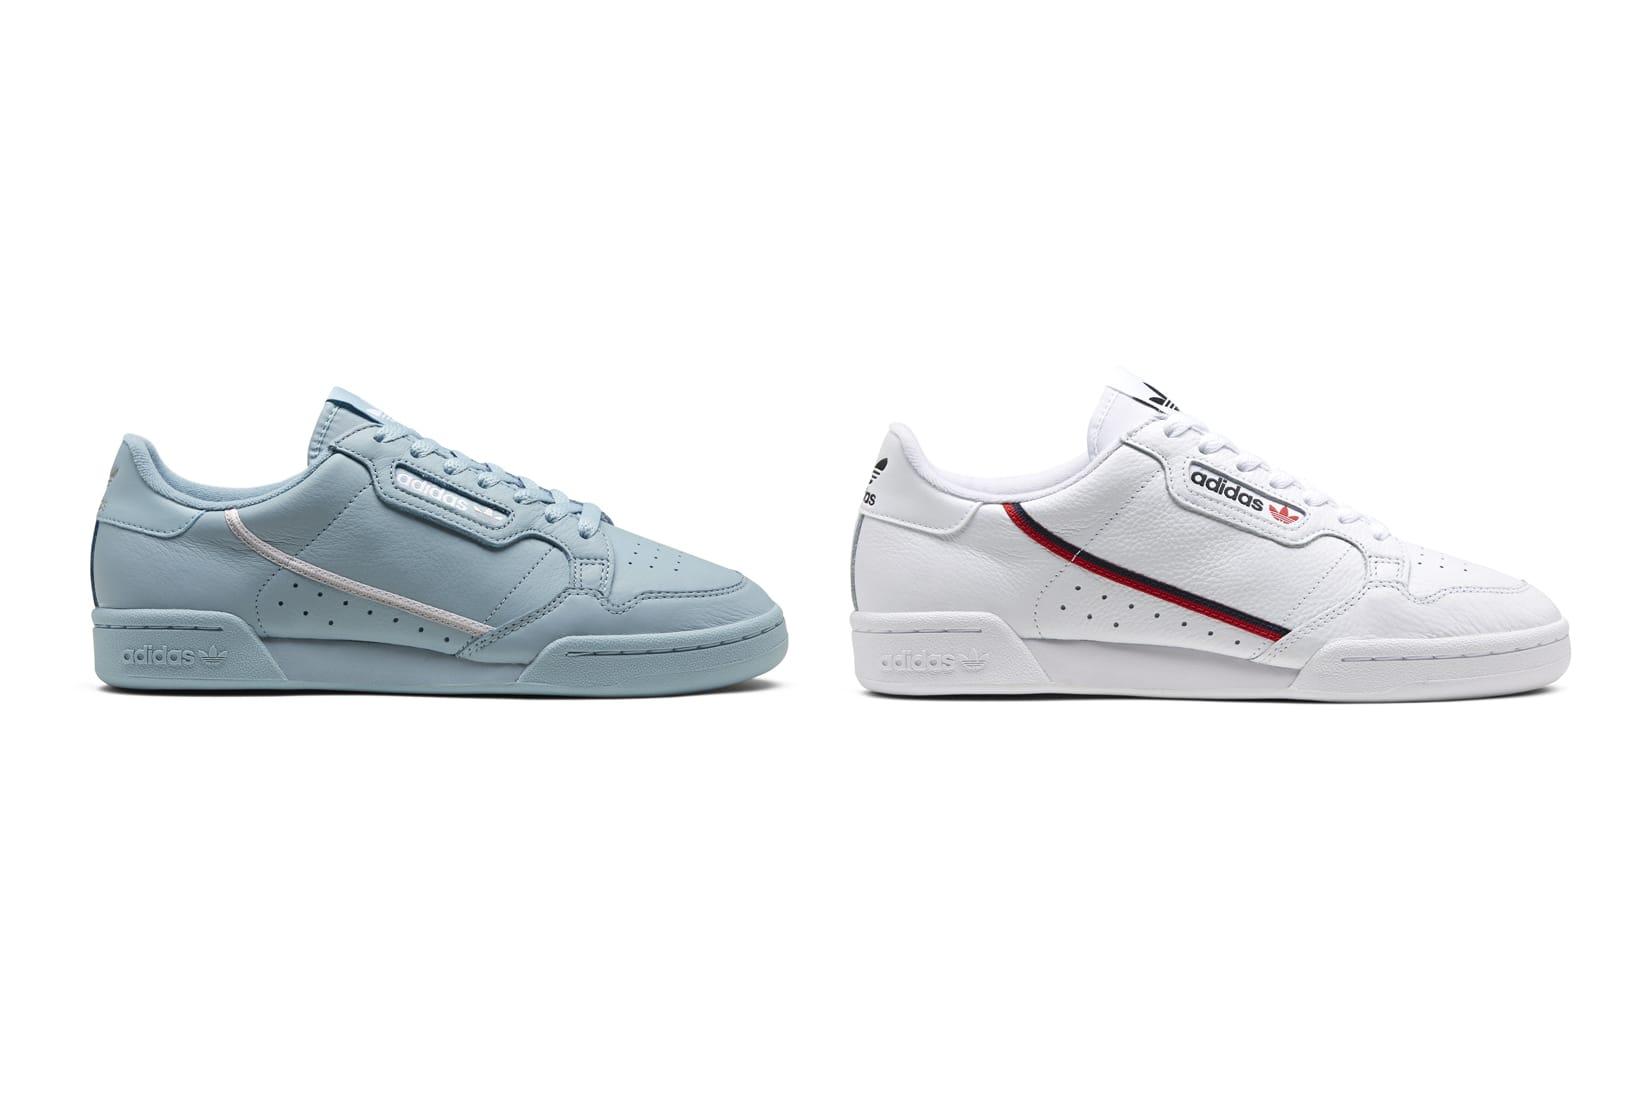 adidas Originals Continental 80 SS19